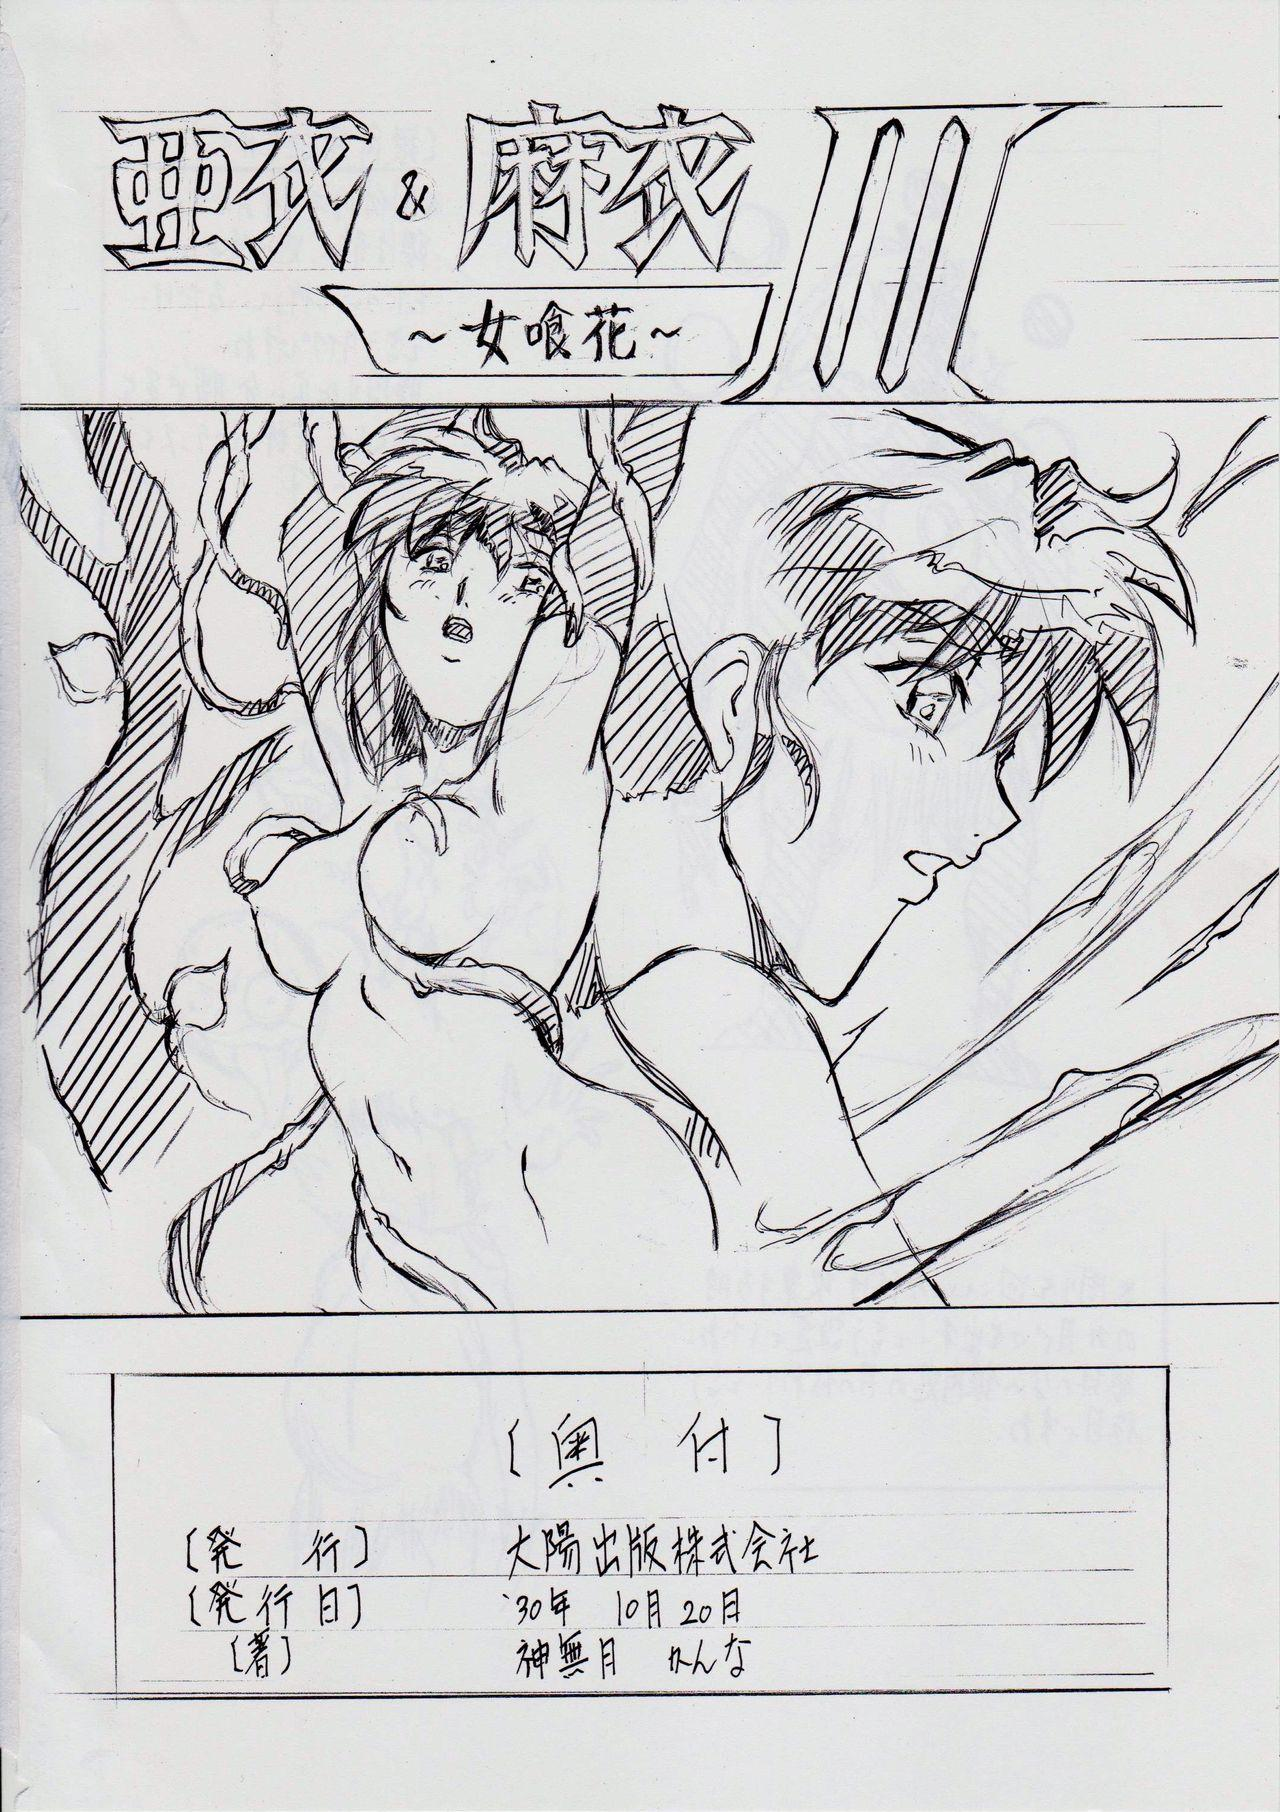 [Busou Megami (Kannaduki Kanna)] 亜衣&麻衣 ~女喰花~ II (Injuu Seisen Twin Angels) 21